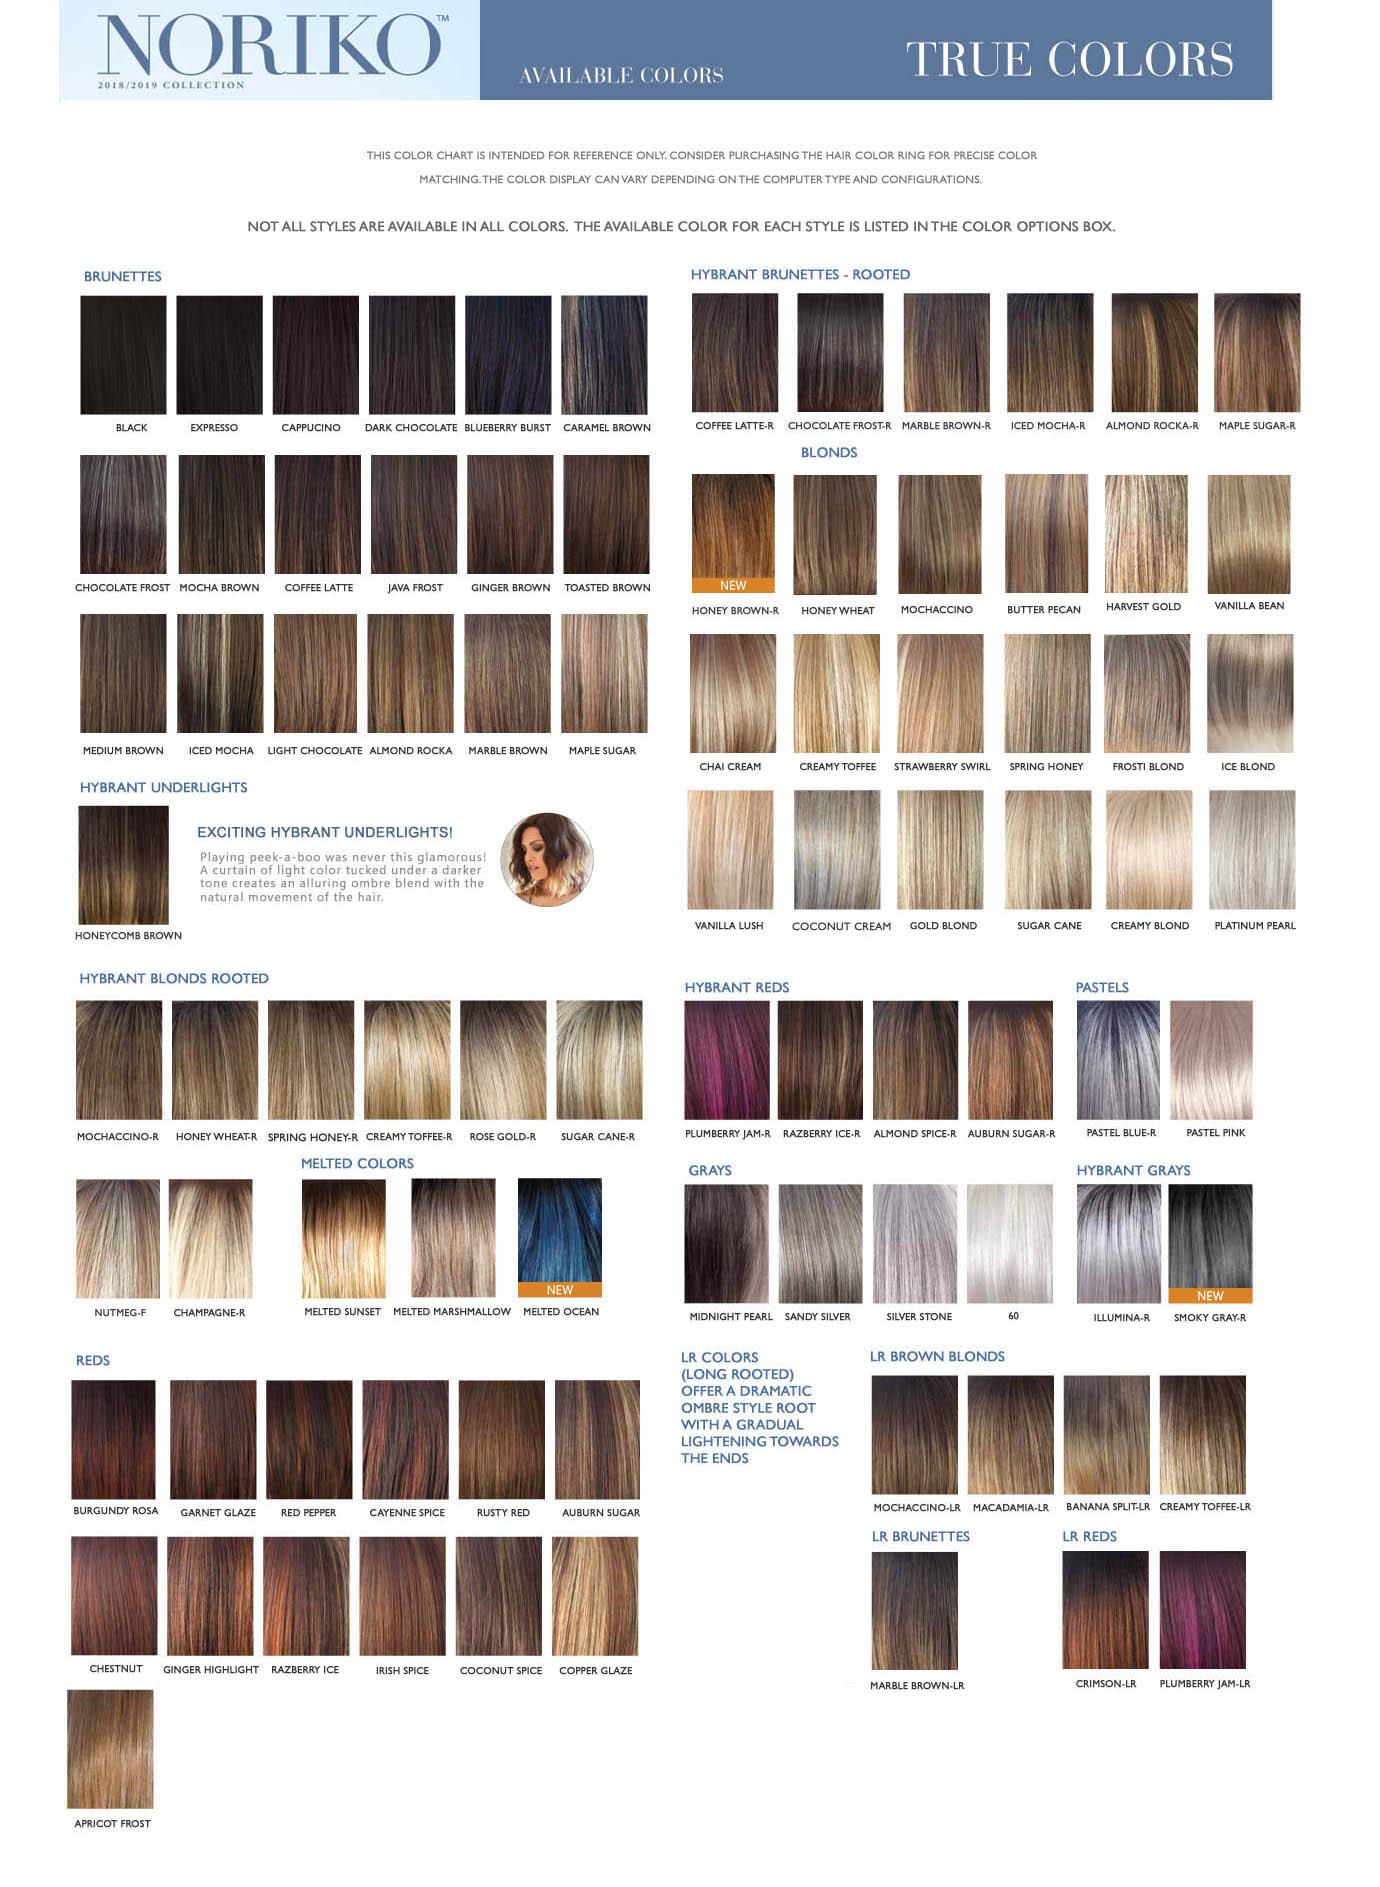 noriko hair color chart